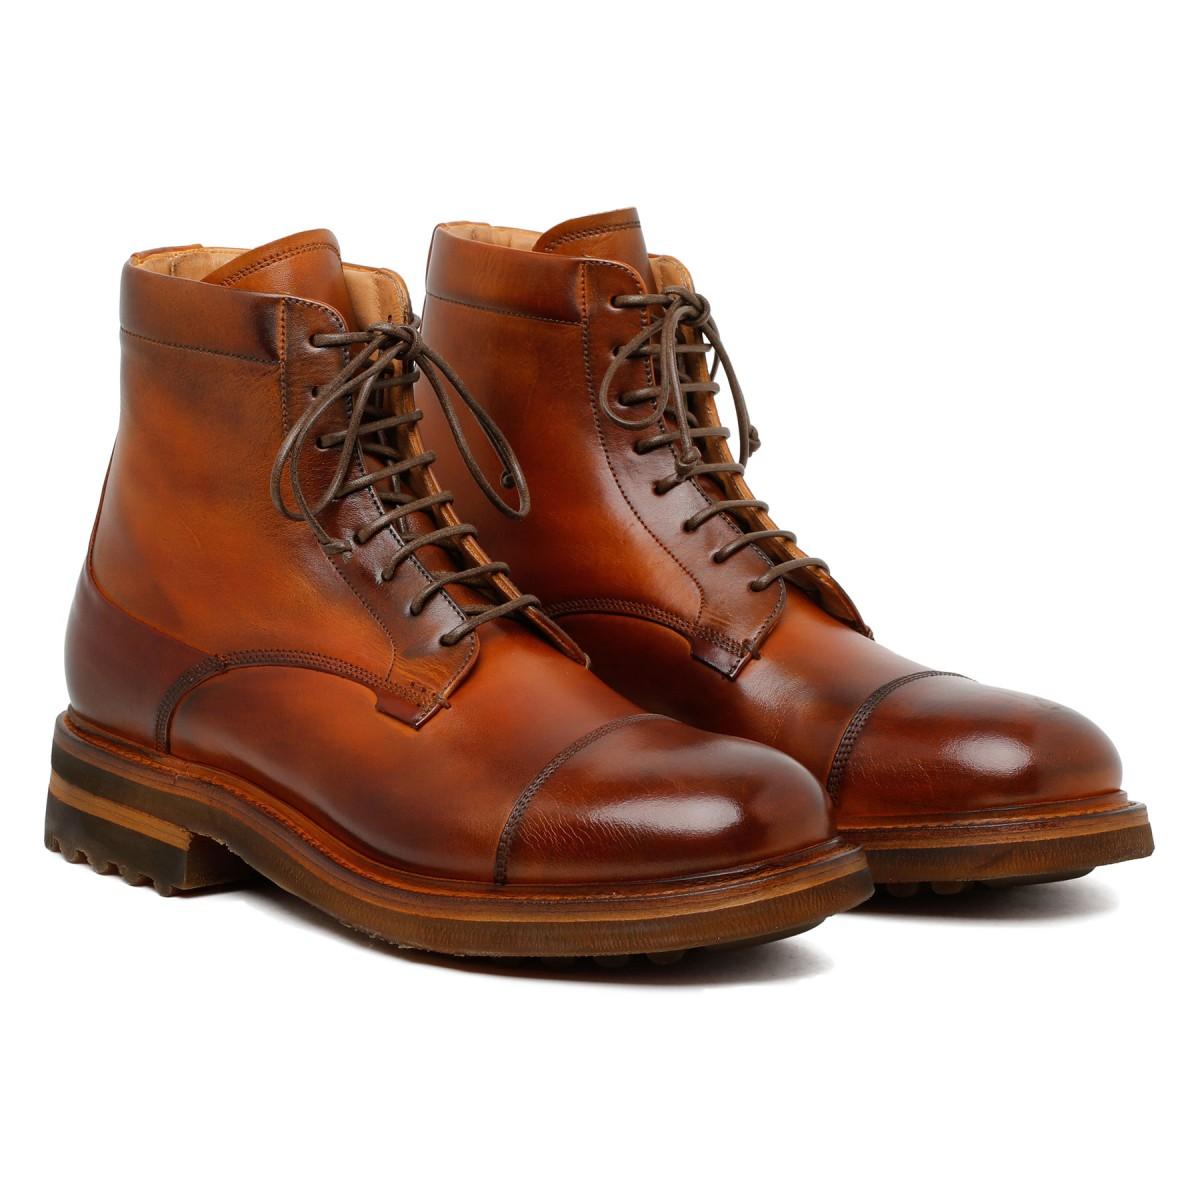 St. Moritz cream leather booties